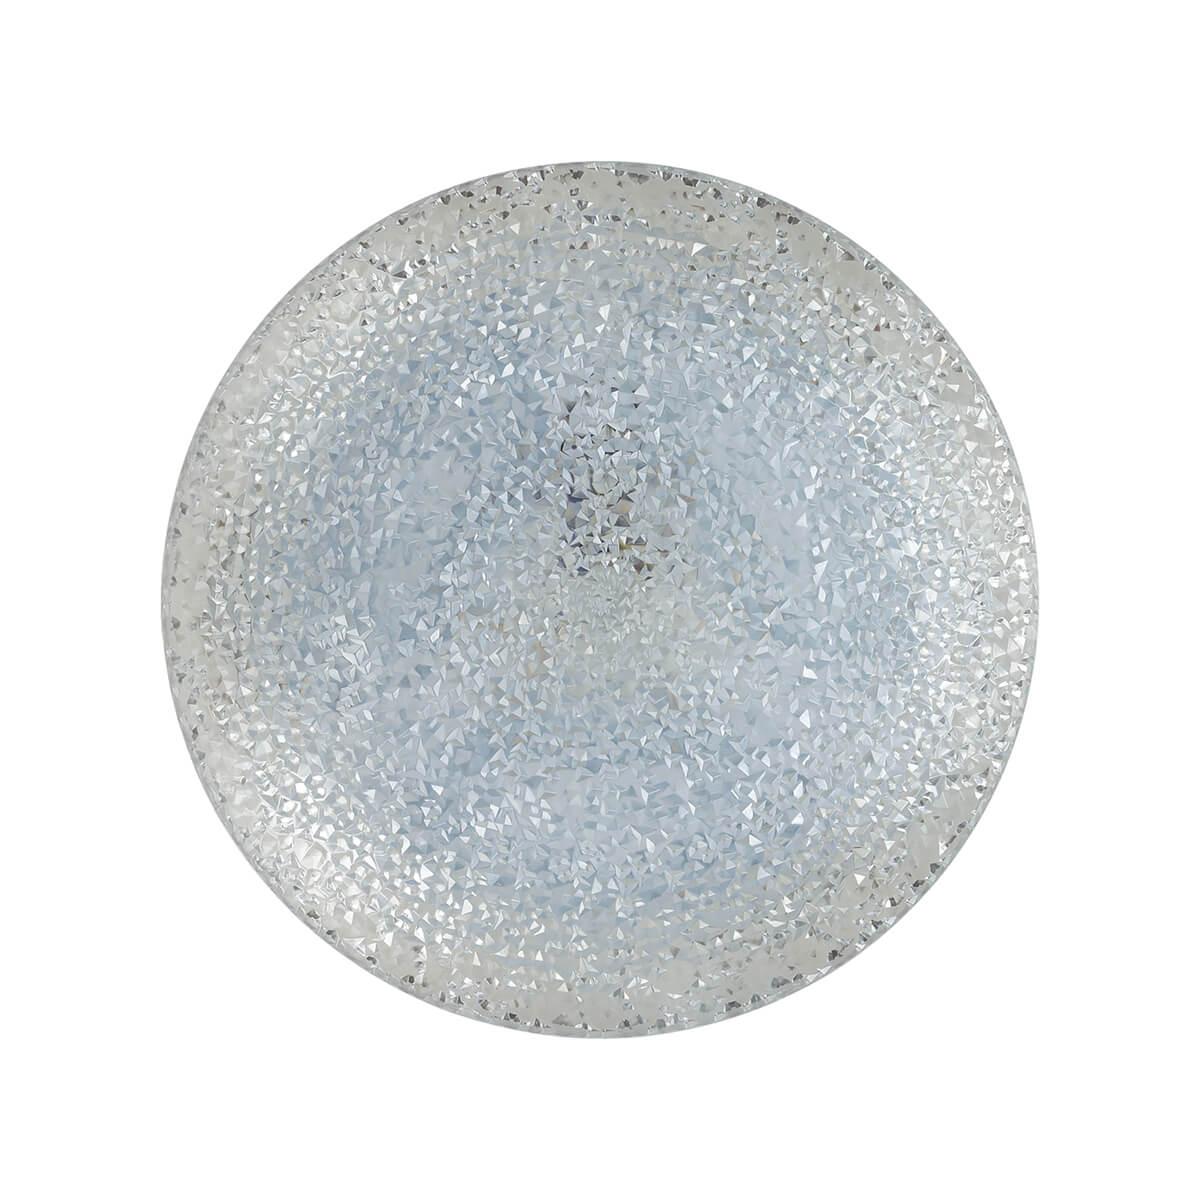 цена на Светильник Sonex 2081/EL Glori